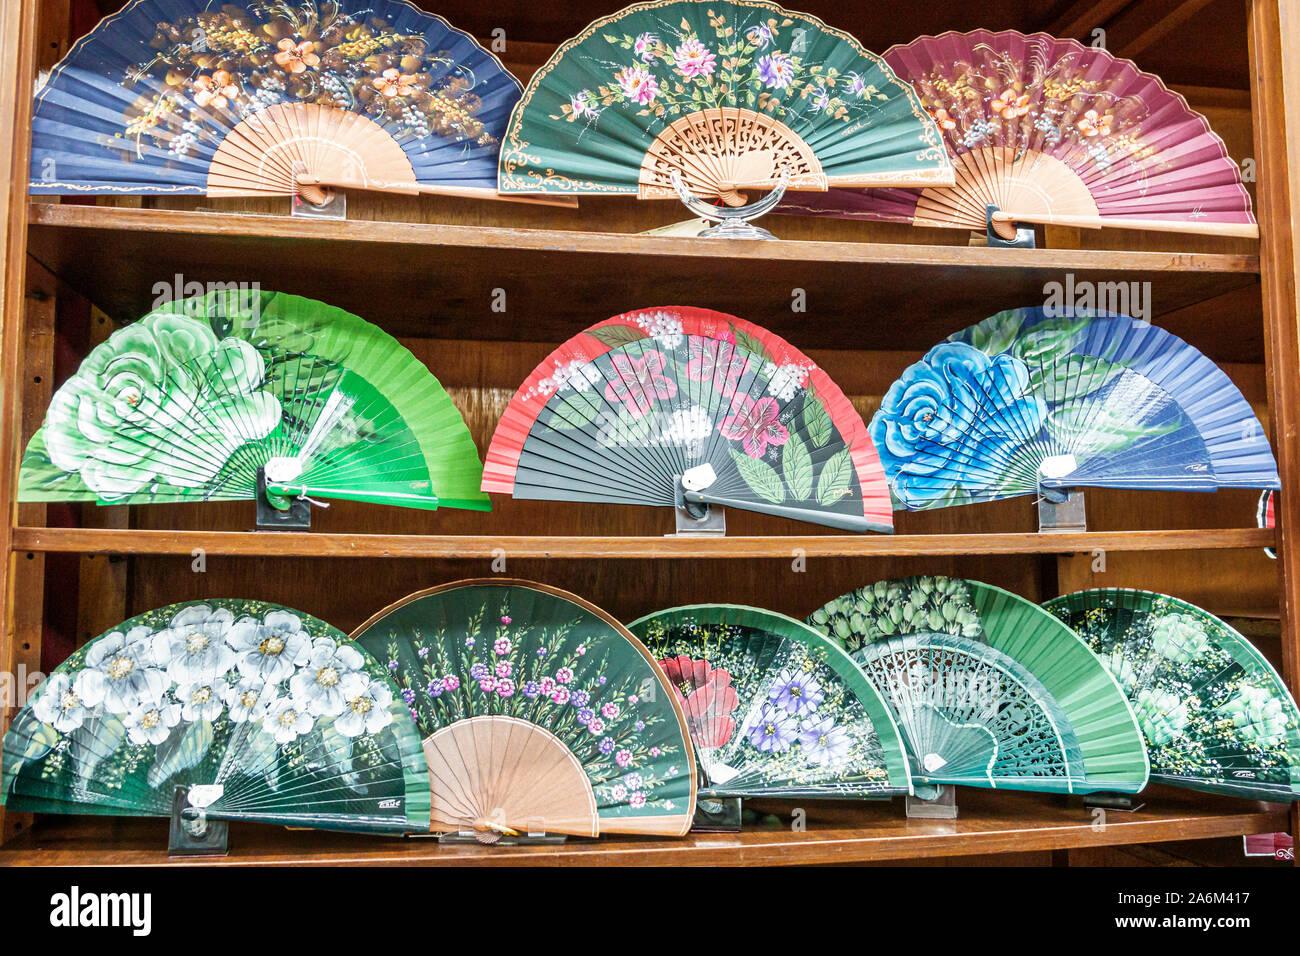 Valencia Spain Hispanic,Ciutat Vella,old city,historic center,Plaza de la Reina,store,souvenirs,artisanal gifts,hand fans,painted,display sale shelves Stock Photo